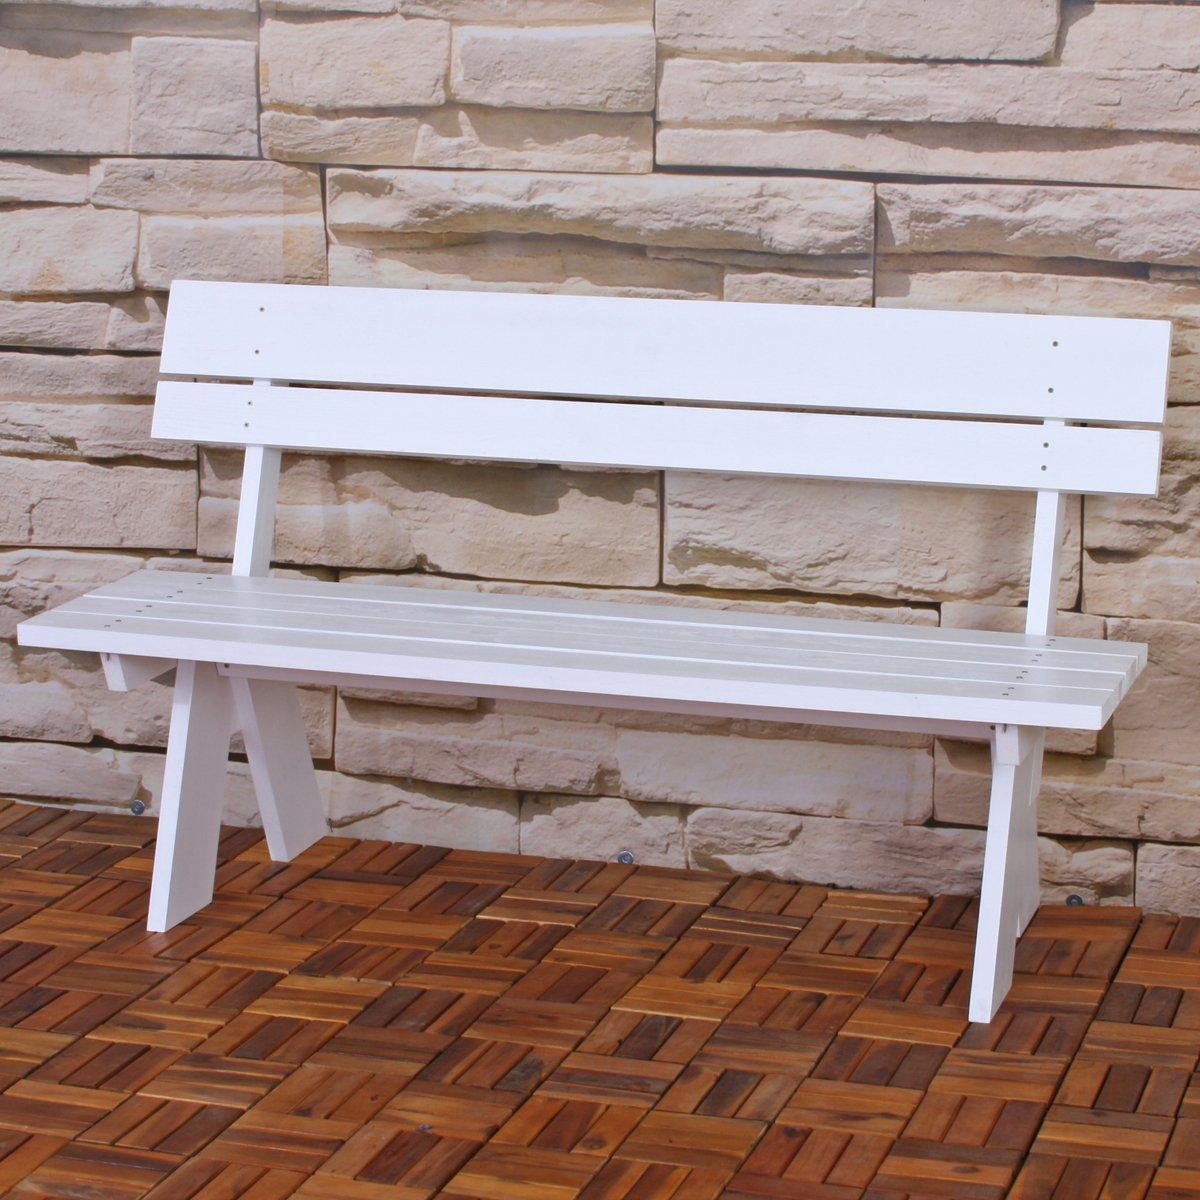 Banco de madera maciza para jard n oslo color blanco - Banco madera jardin ...